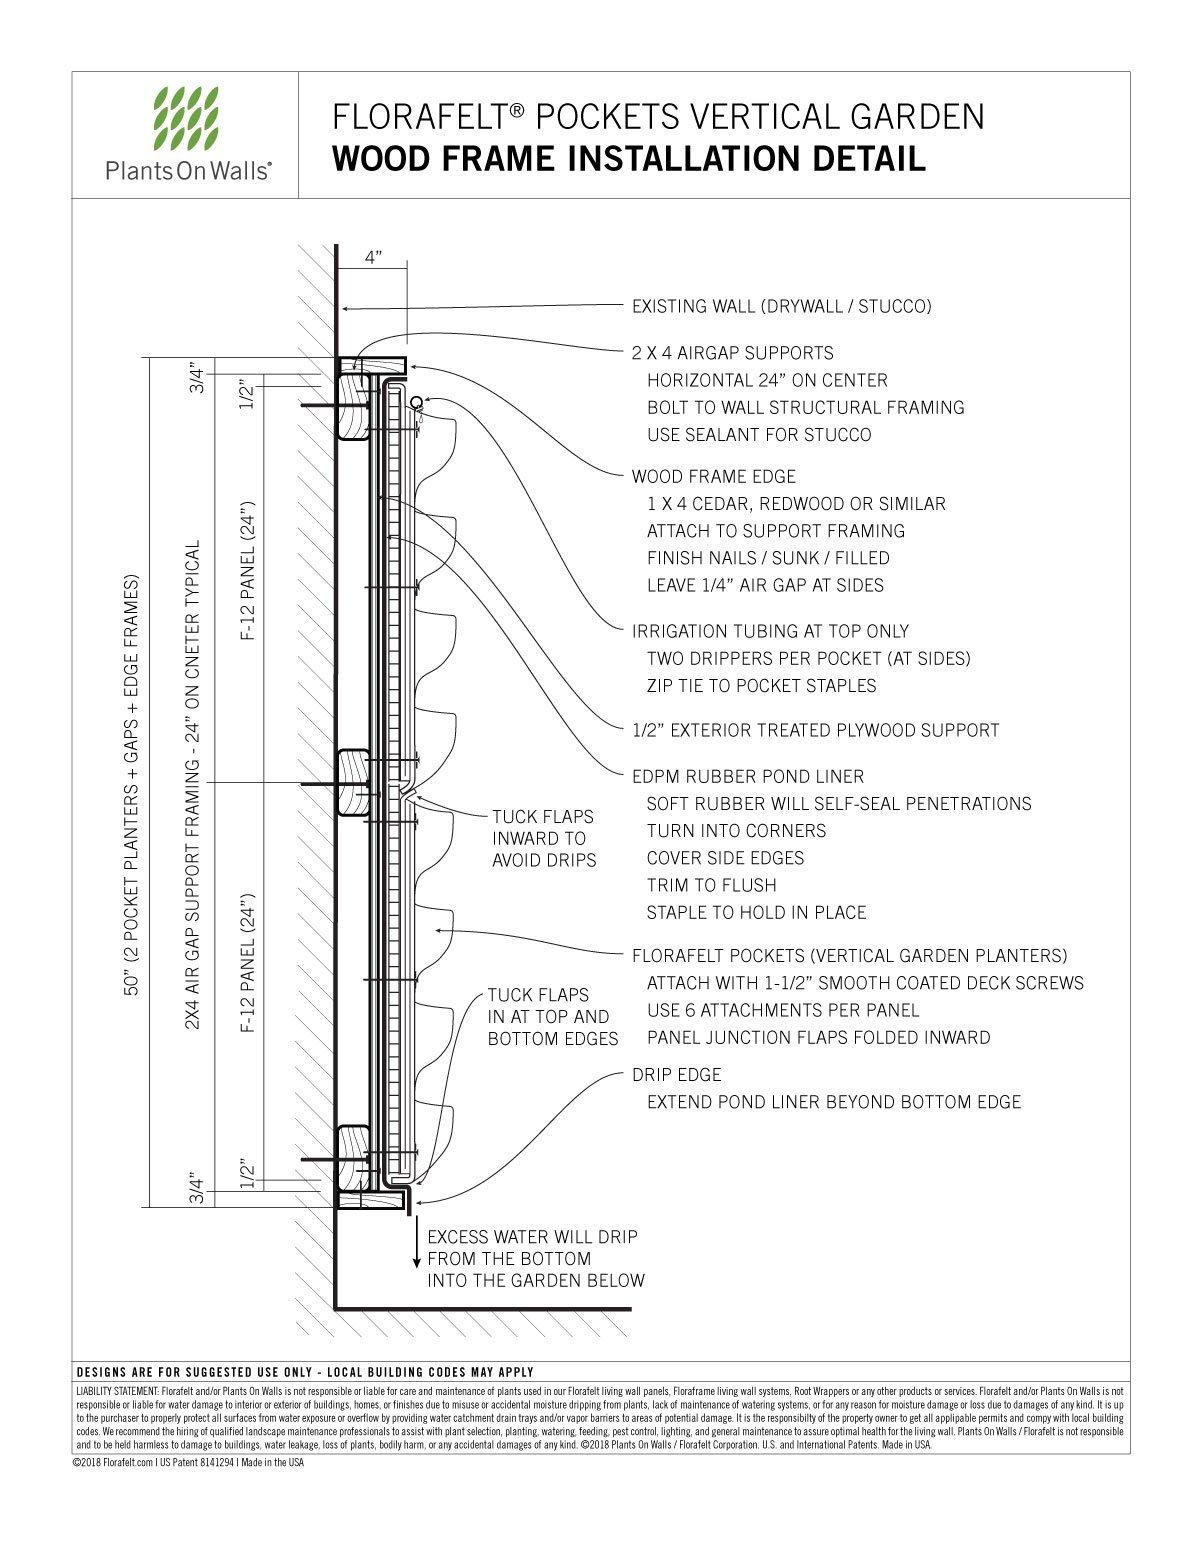 Florafelt-Pockets-Mounting-Wood-Frame-Installation-Detail | Plants ...